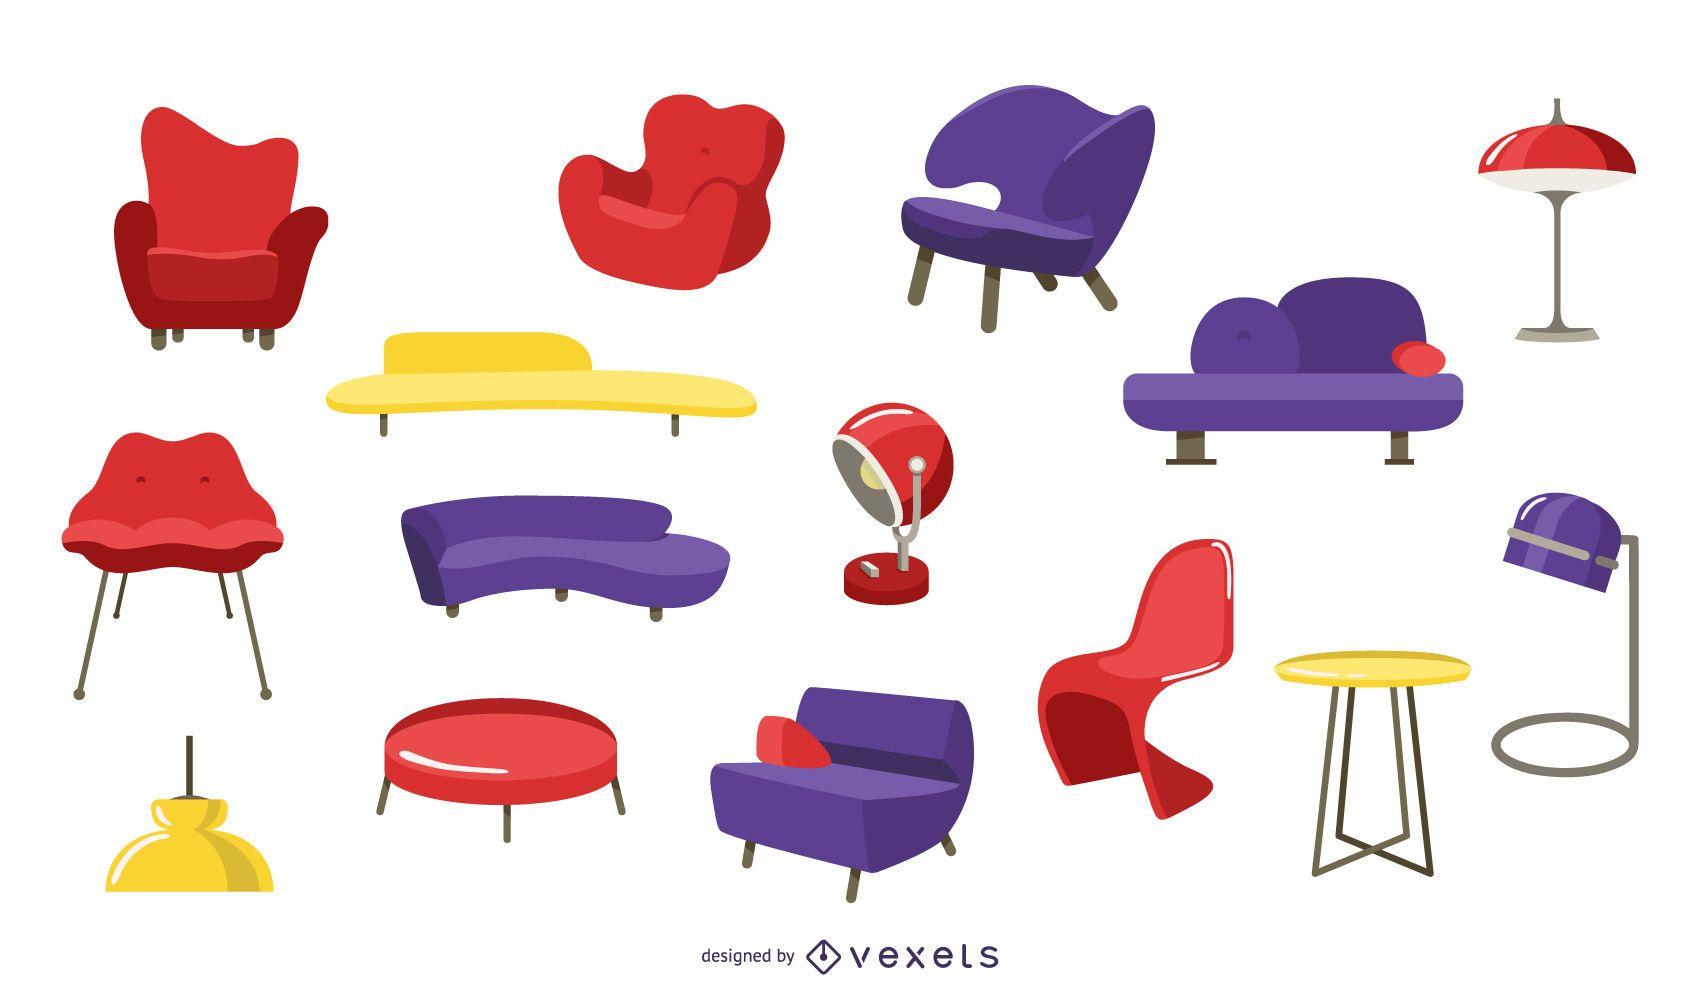 Pop art furniture collection